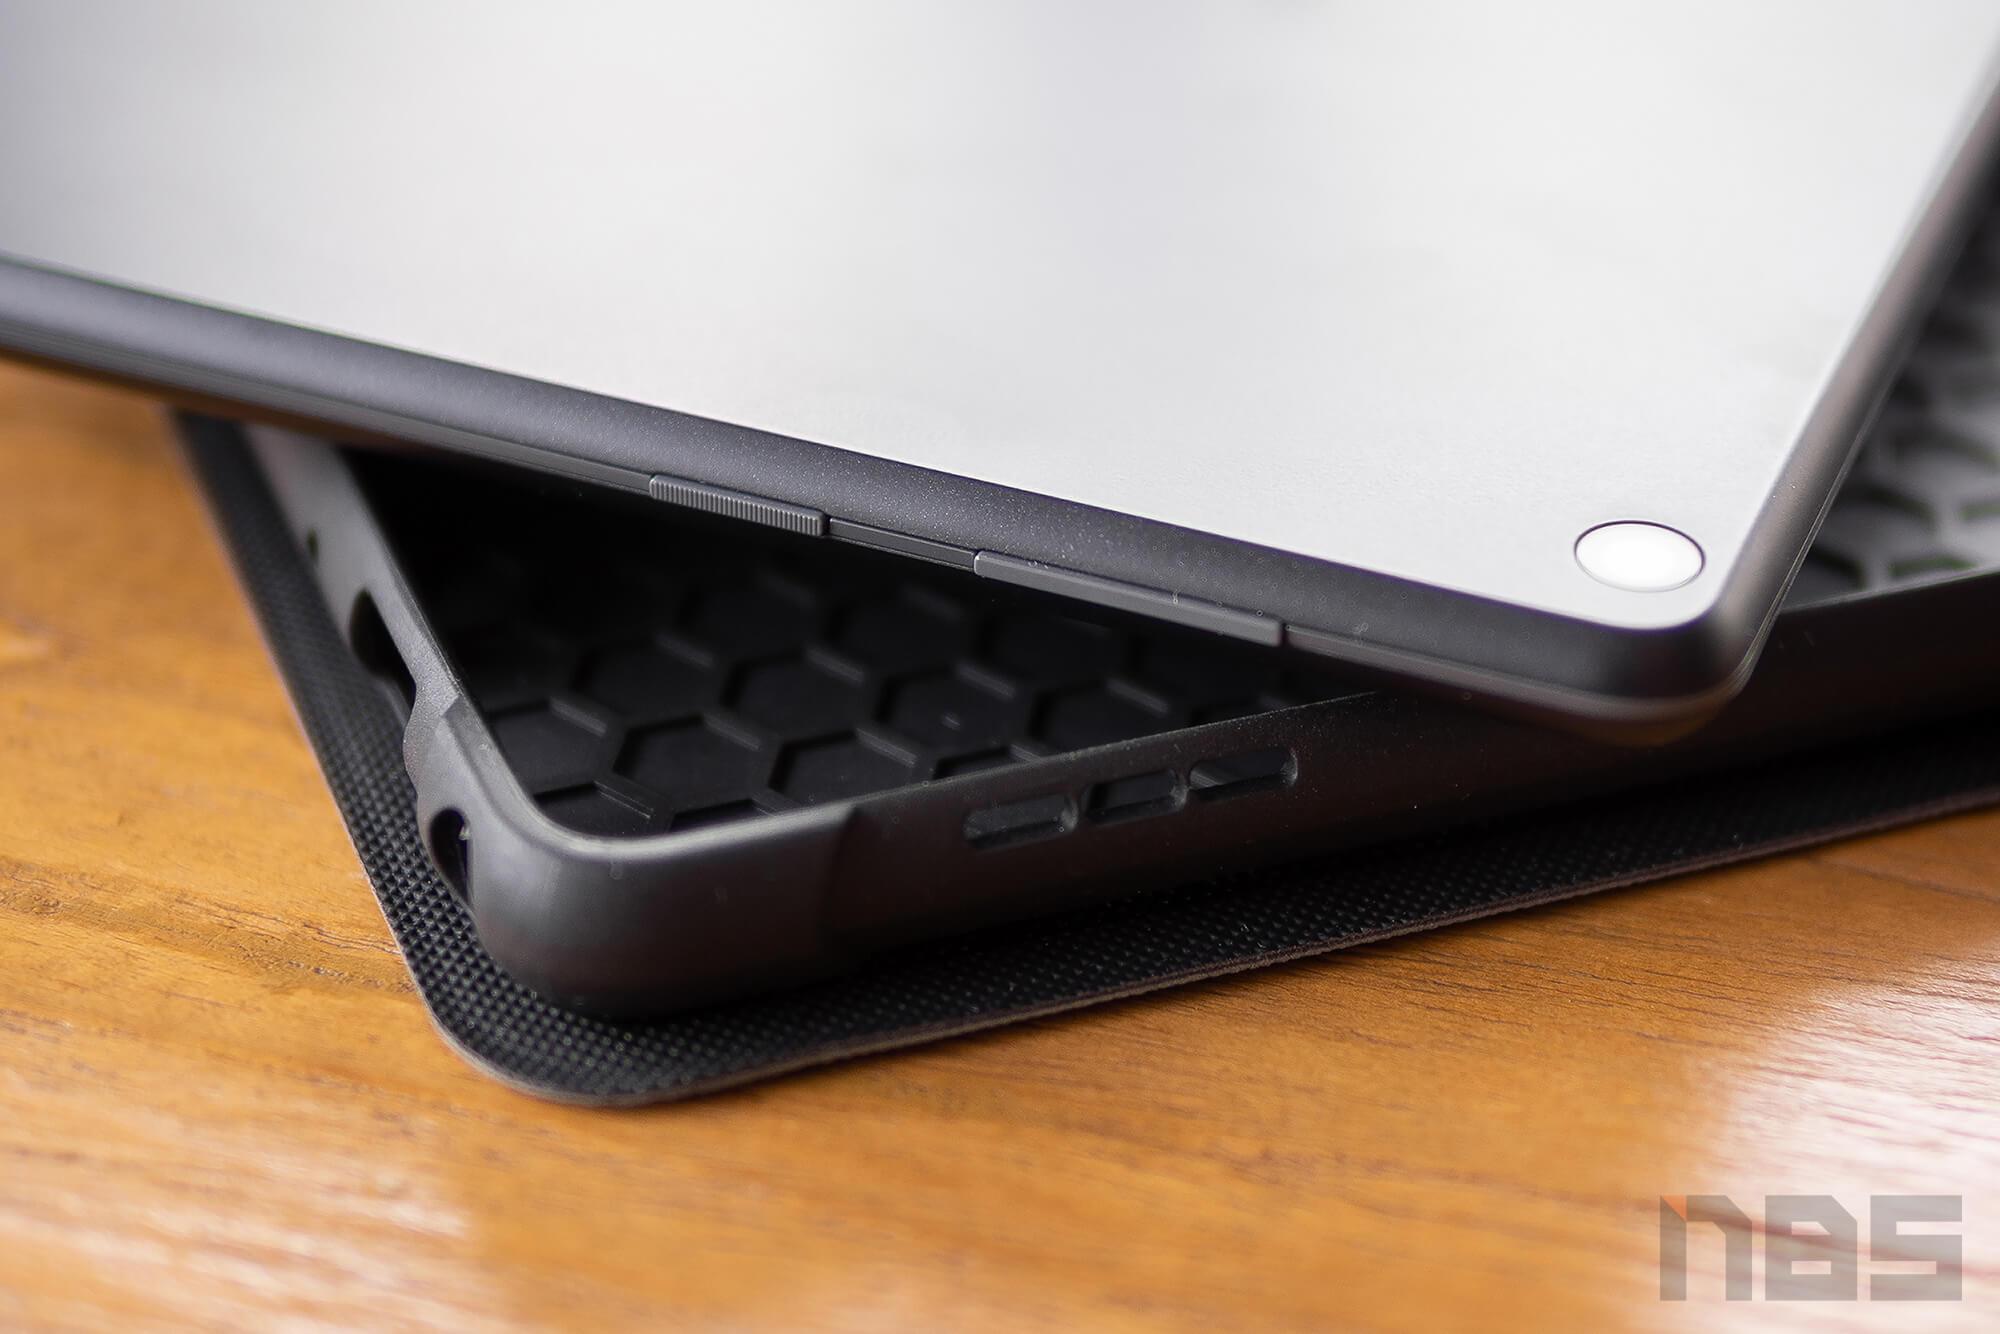 Review Lenovo Tab M10 REL FHD NotebookSPEC 10